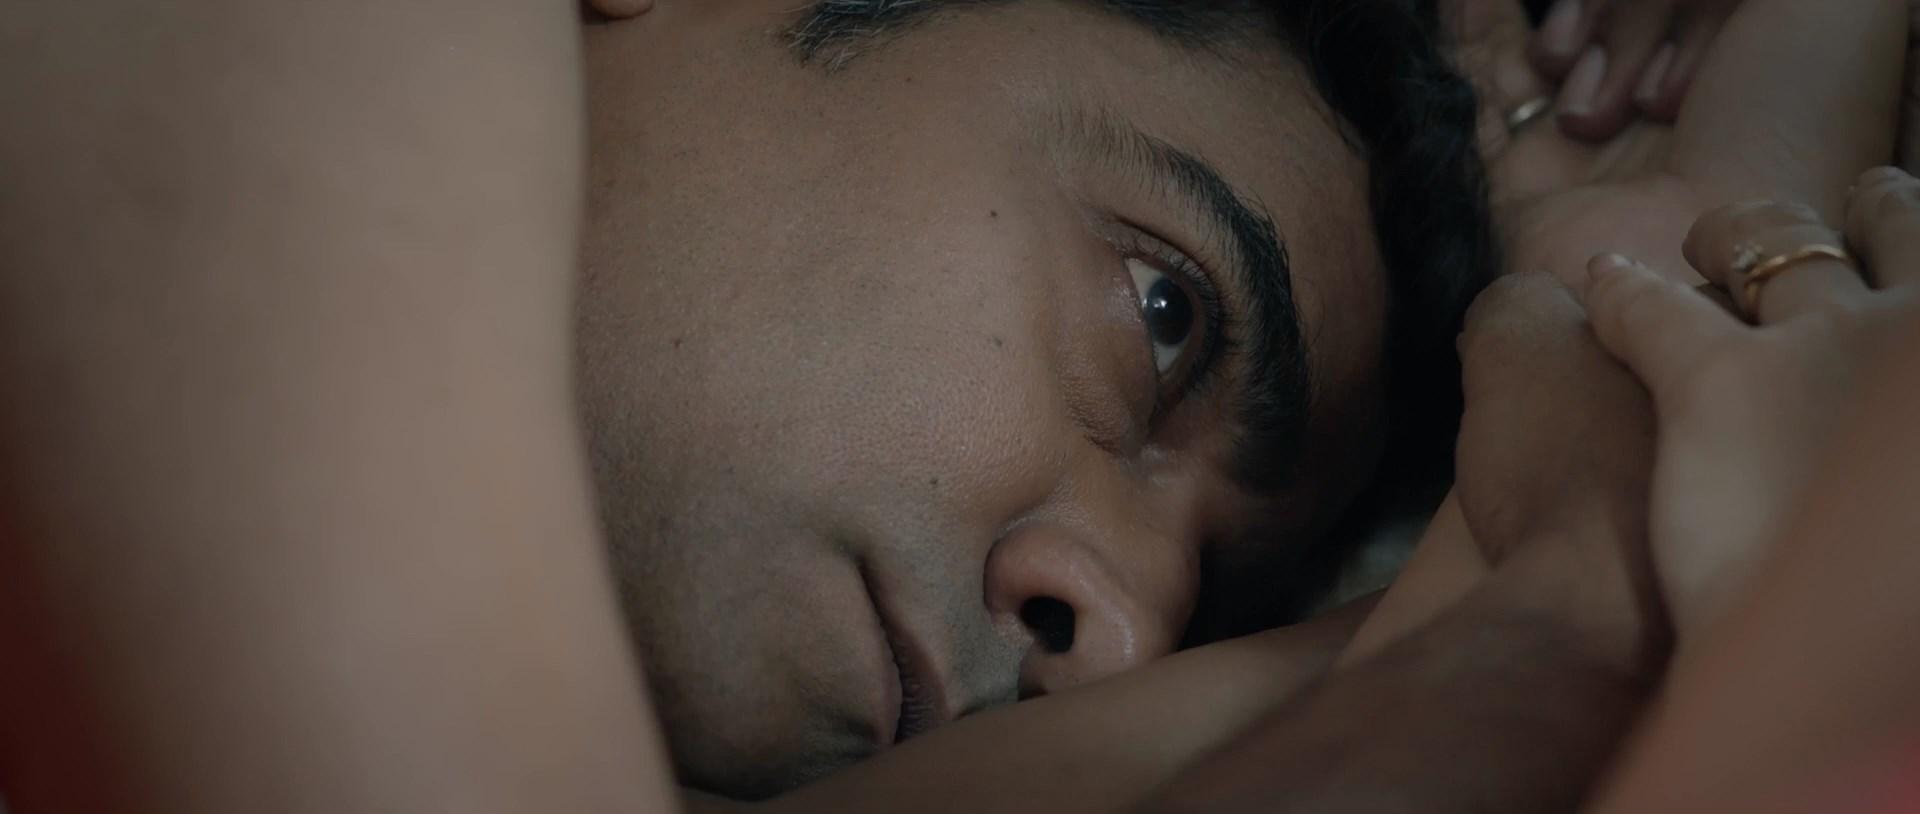 KAYA The Mystery Unfolds 2021 Bengali Movie 1080p WEB DL x264 AAC.mp4 snapshot 00.03.07.333